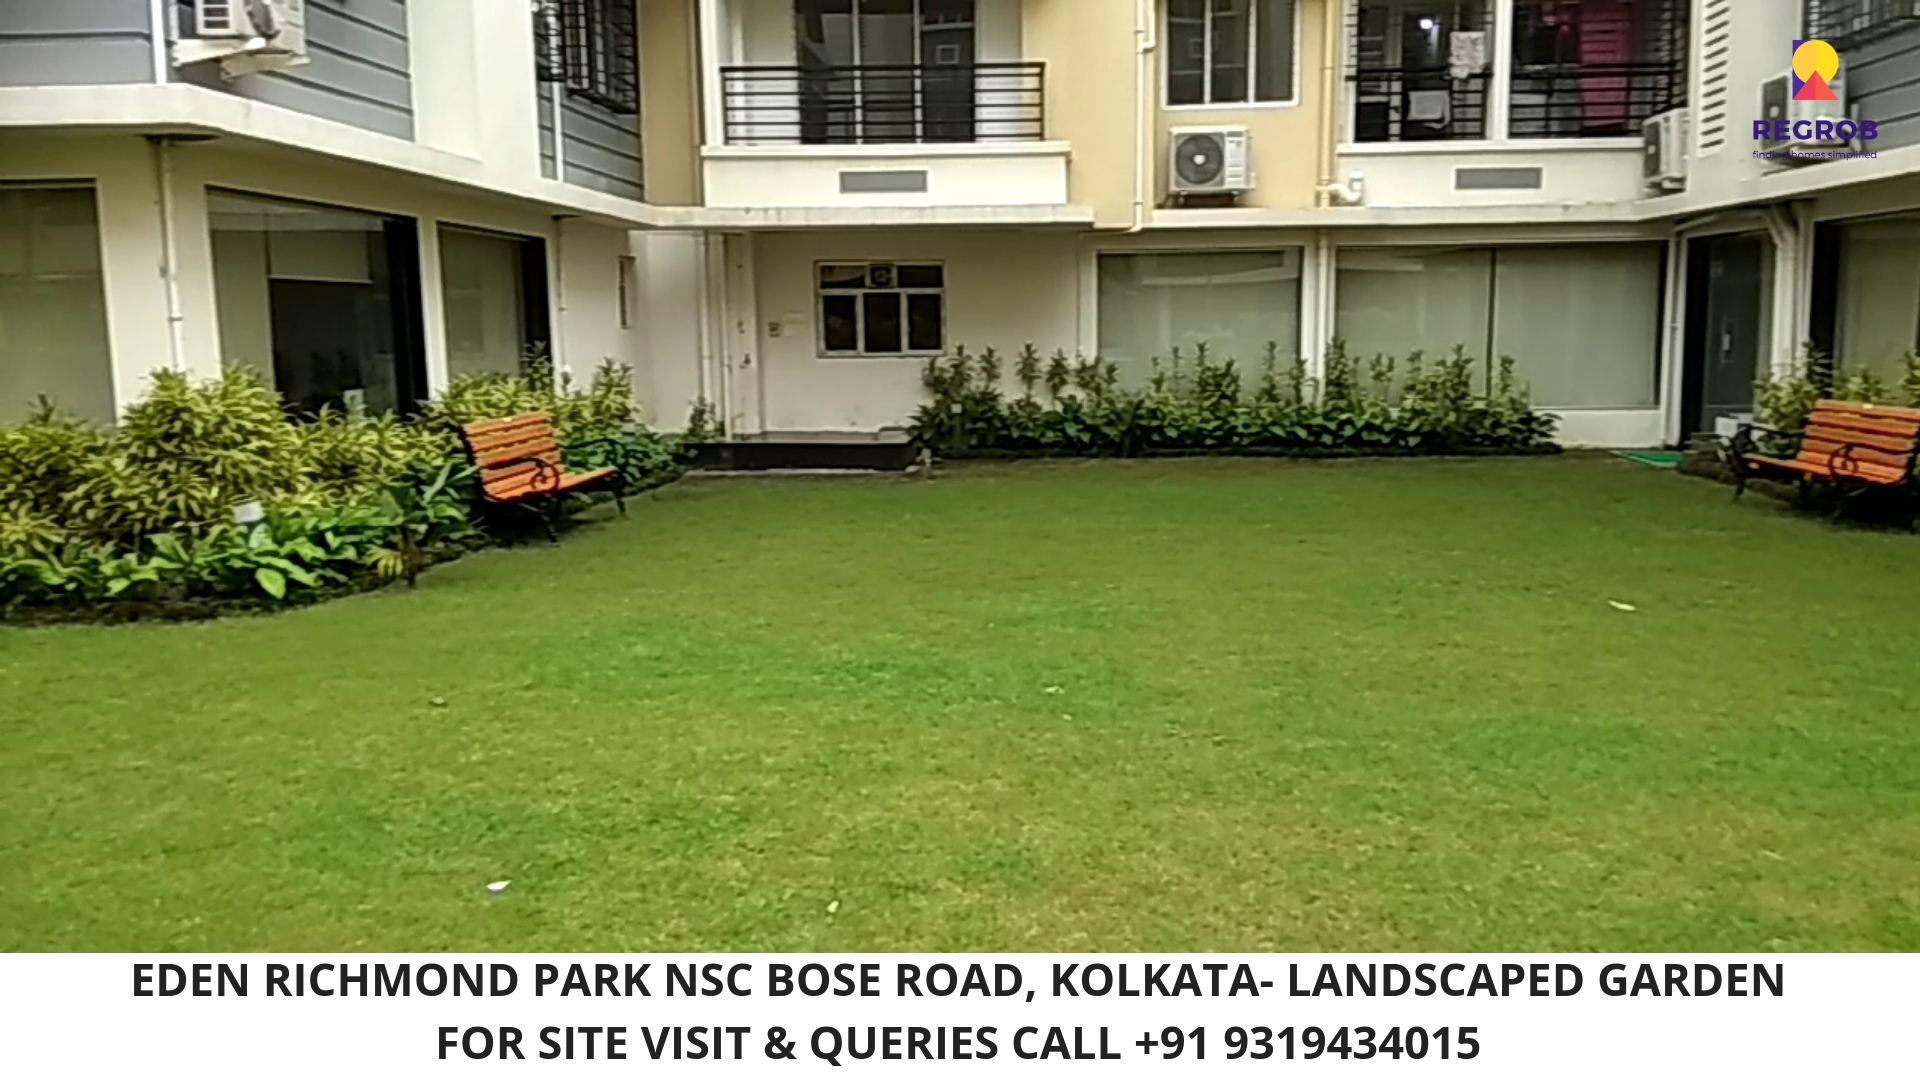 Eden Richmond Park NSC Bose Road Kolkata